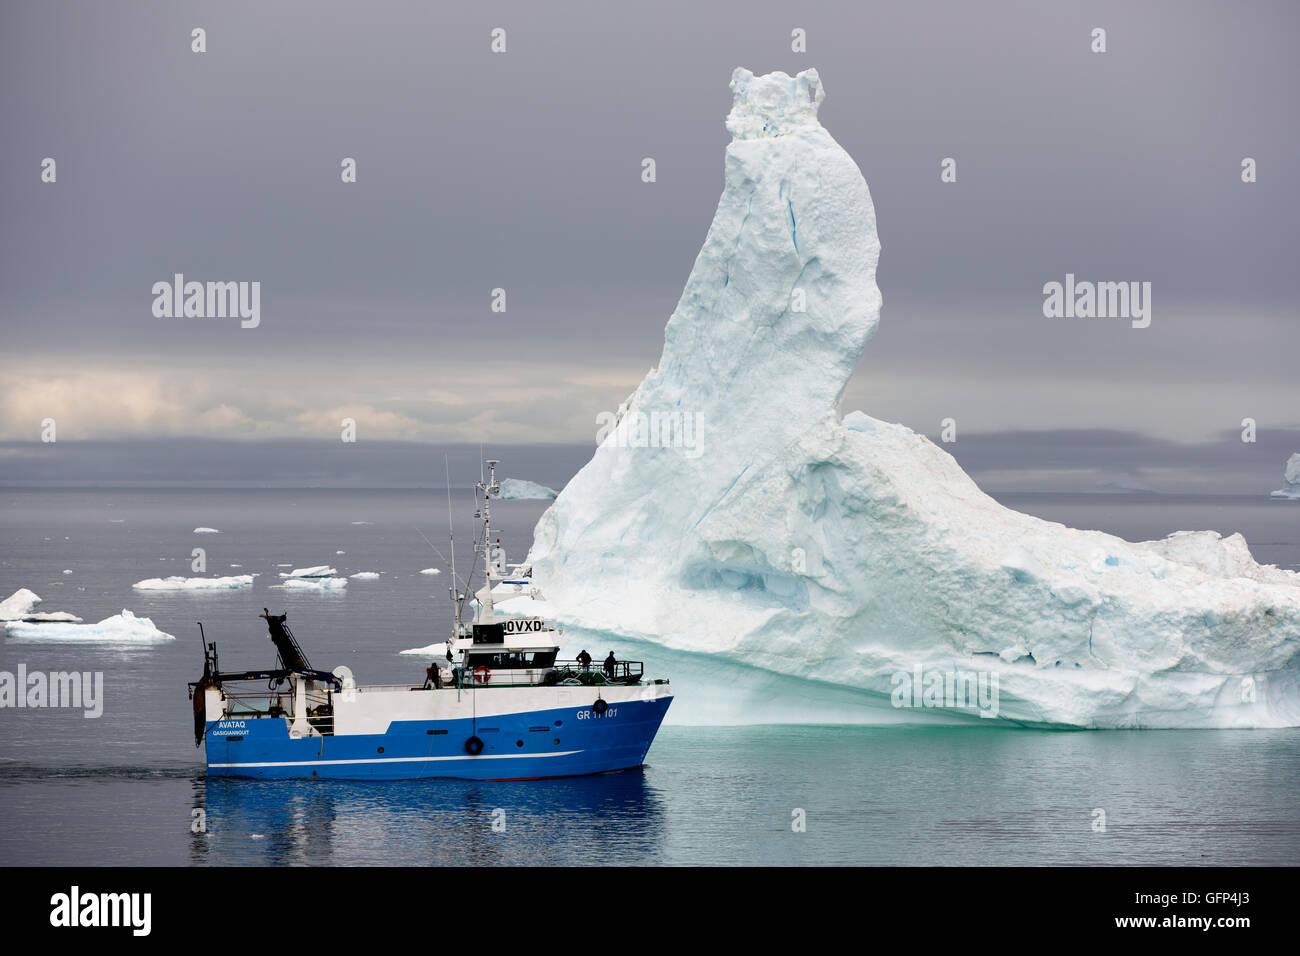 Angelboot/Fischerboot, Icebert, Disko-Bucht, Ilulissat, Grönland Stockbild